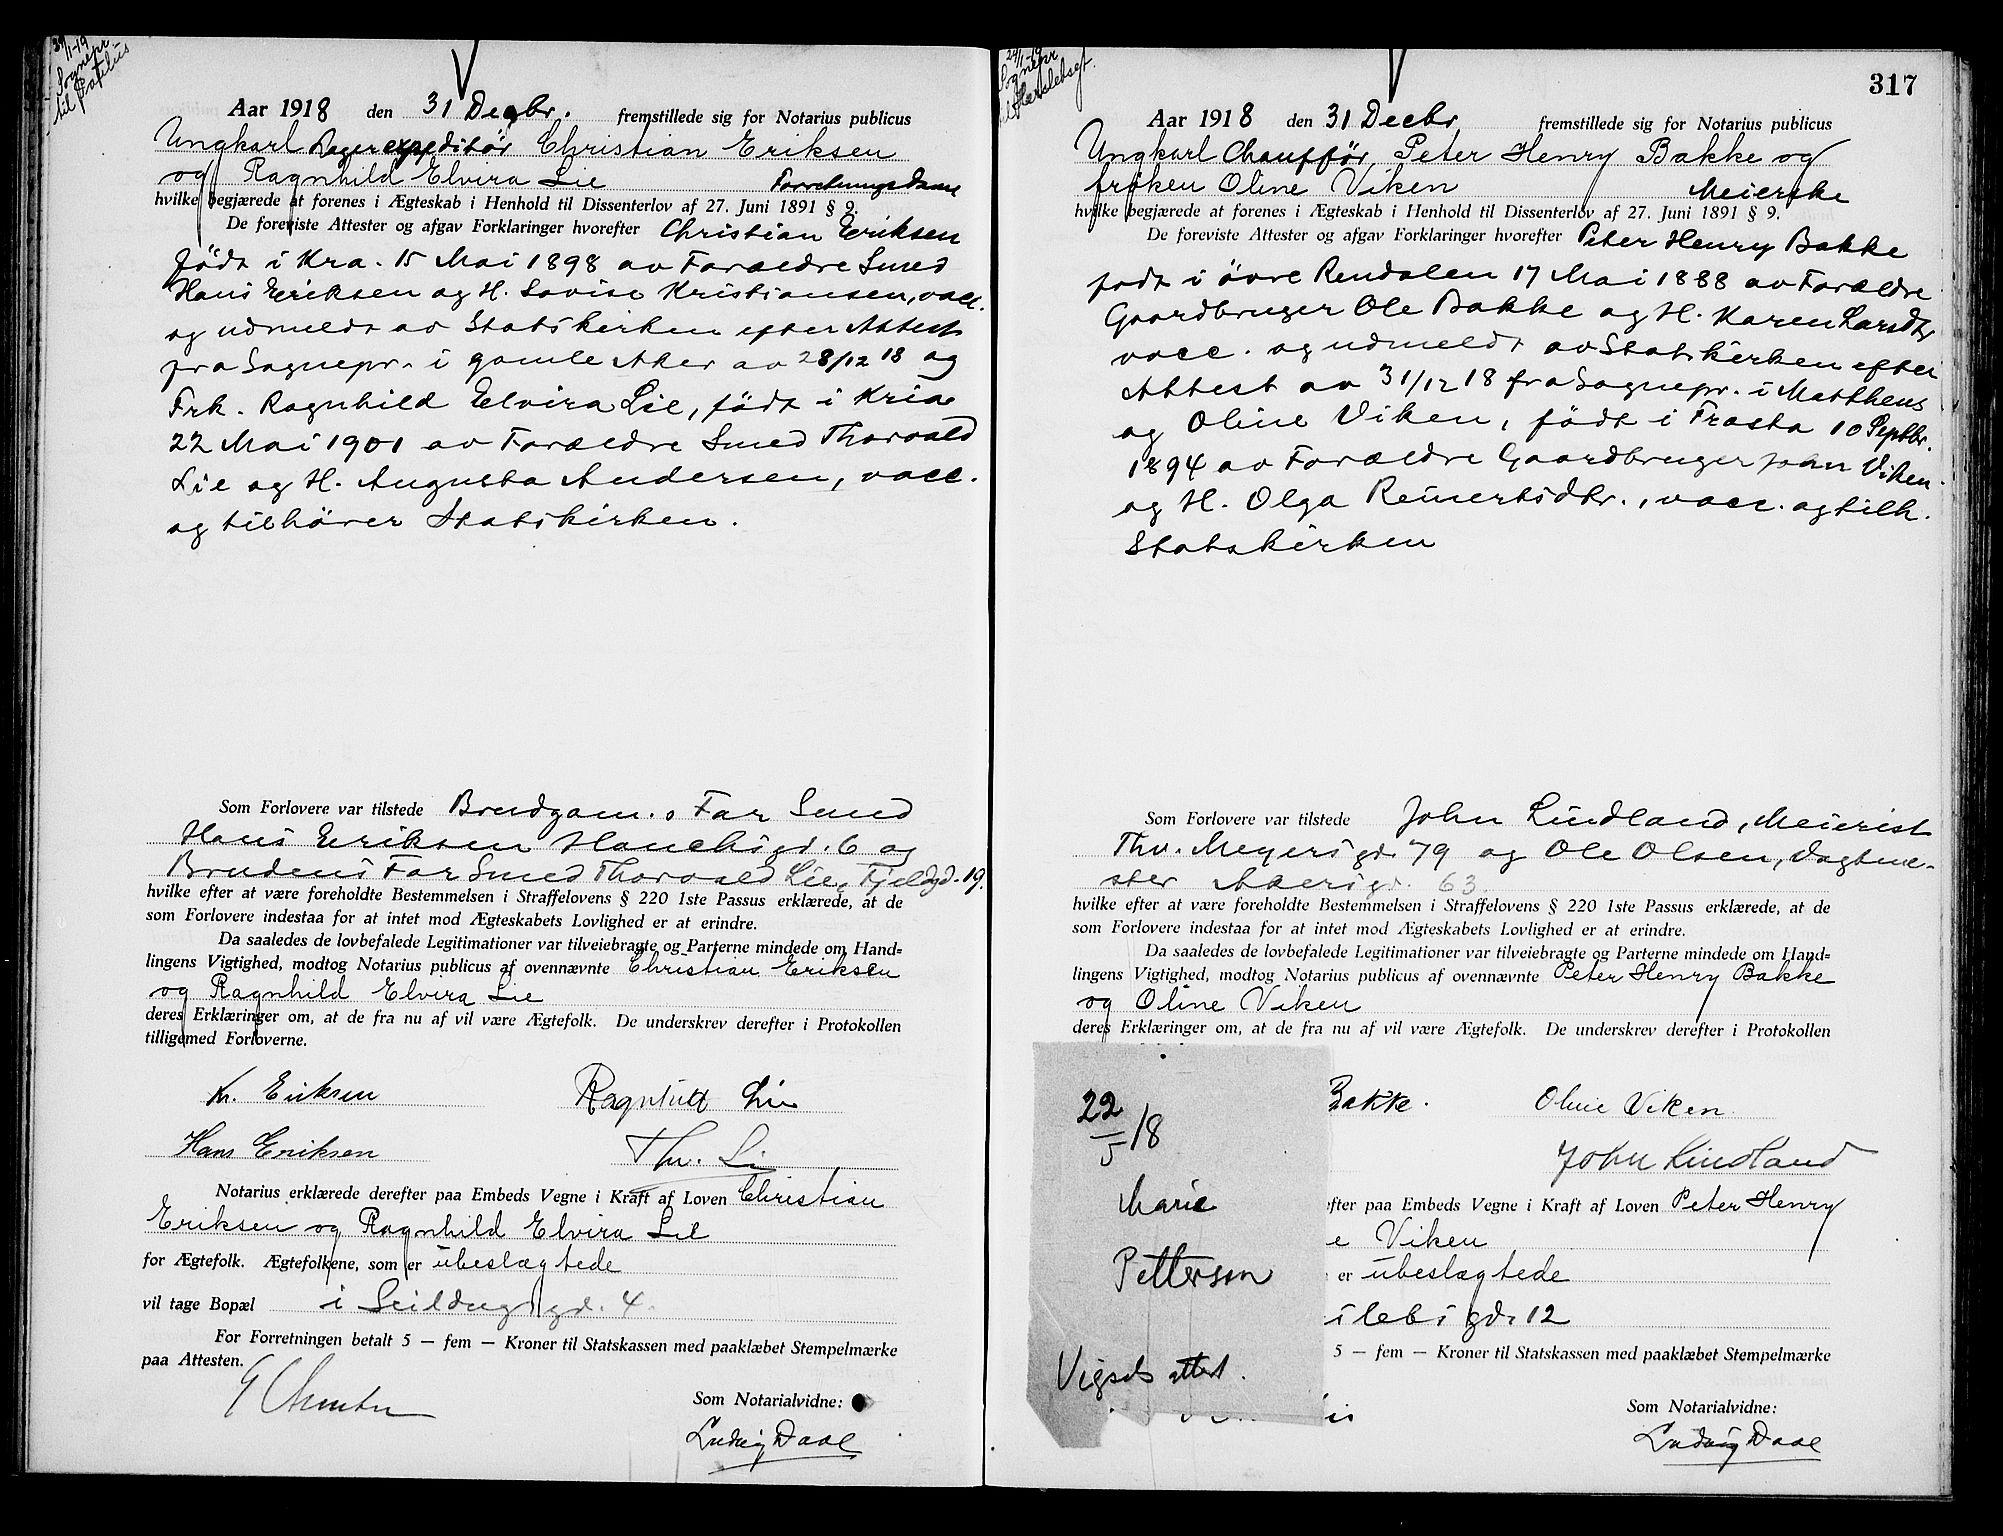 SAO, Oslo byfogd avd. I, L/Lb/Lbb/L0012: Notarialprotokoll, rekke II: Vigsler, 1918-1919, s. 316b-317a